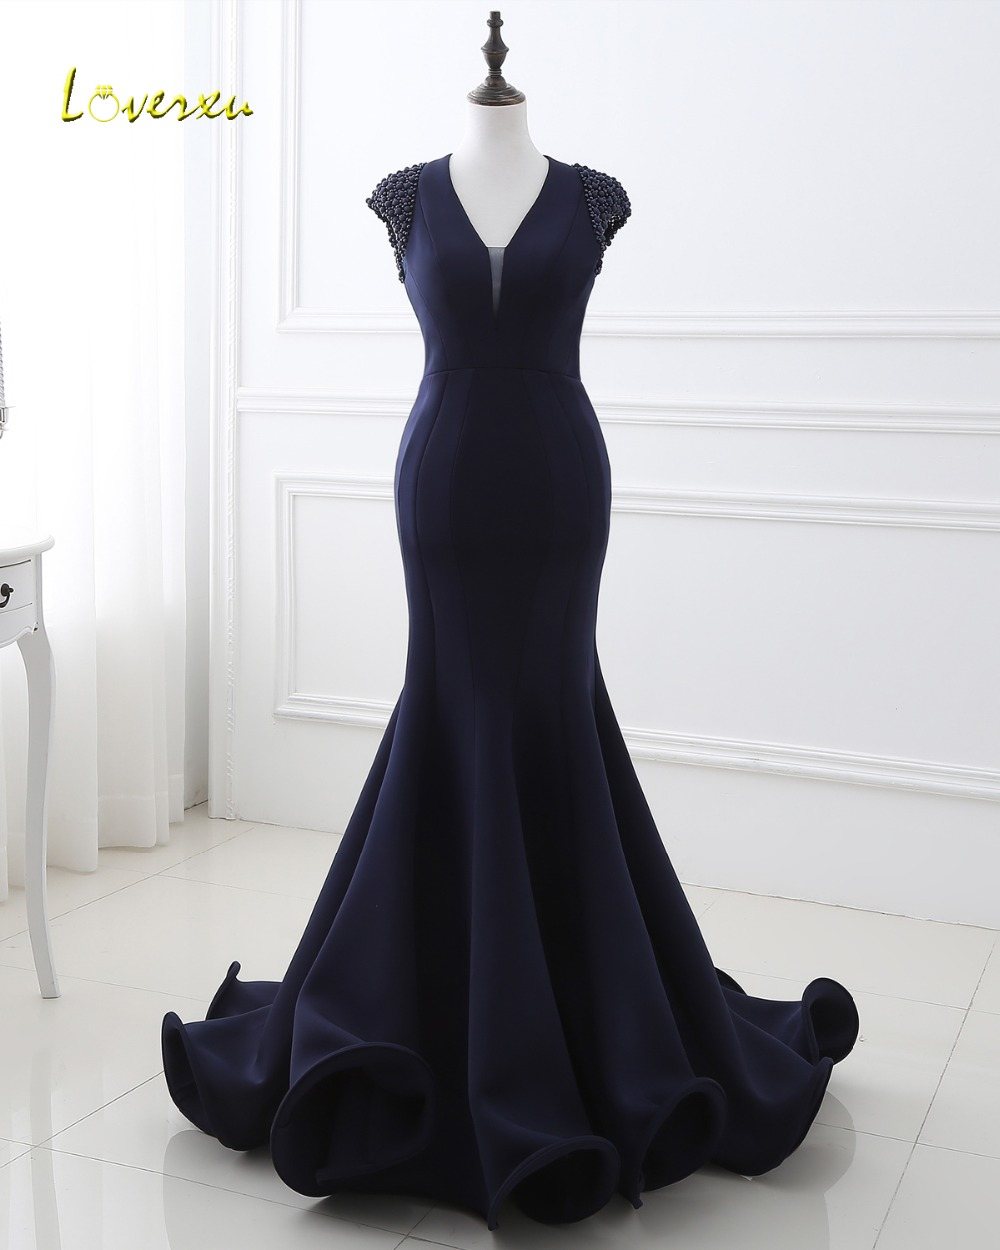 Loverxu Delicate Beaded Cap Sleeve Long Mermaid   Evening     Dresses   2019 Sexy Backless Ruffles Taffeta Prom   Dresses   Vestido de Festa